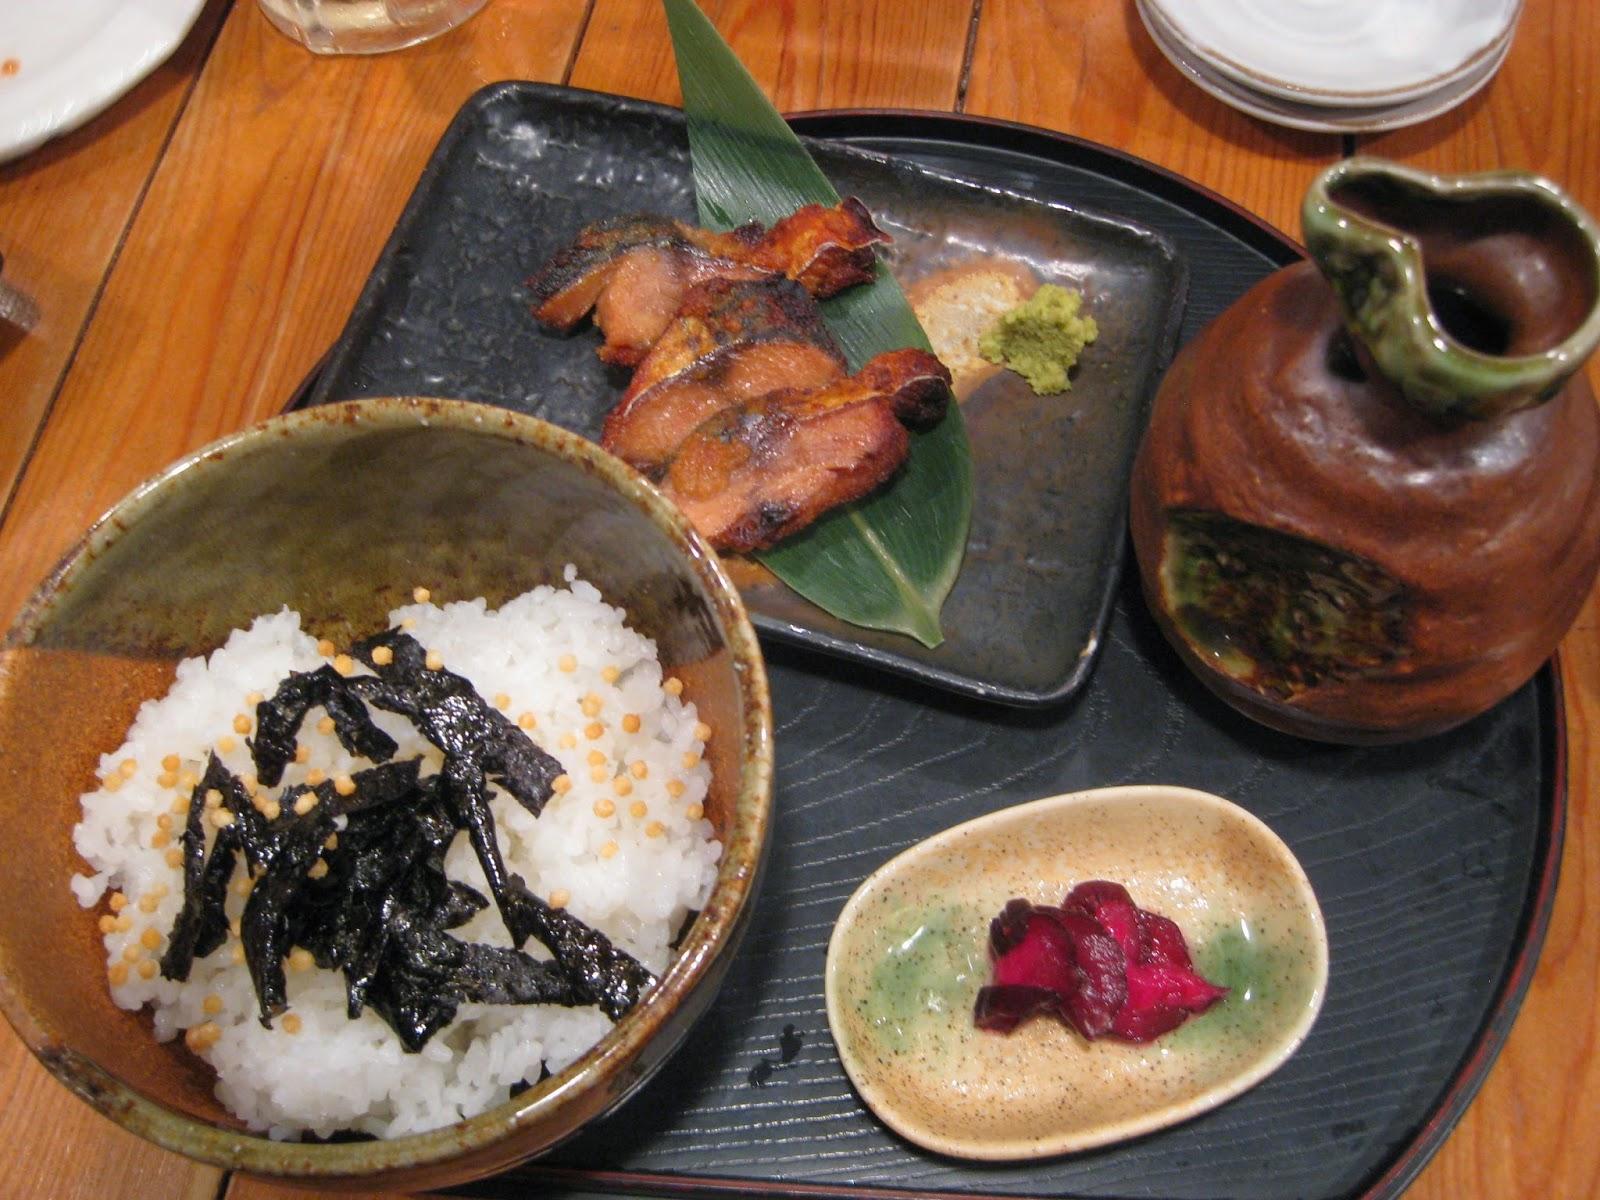 Kyoto - Grilled salty mackerel